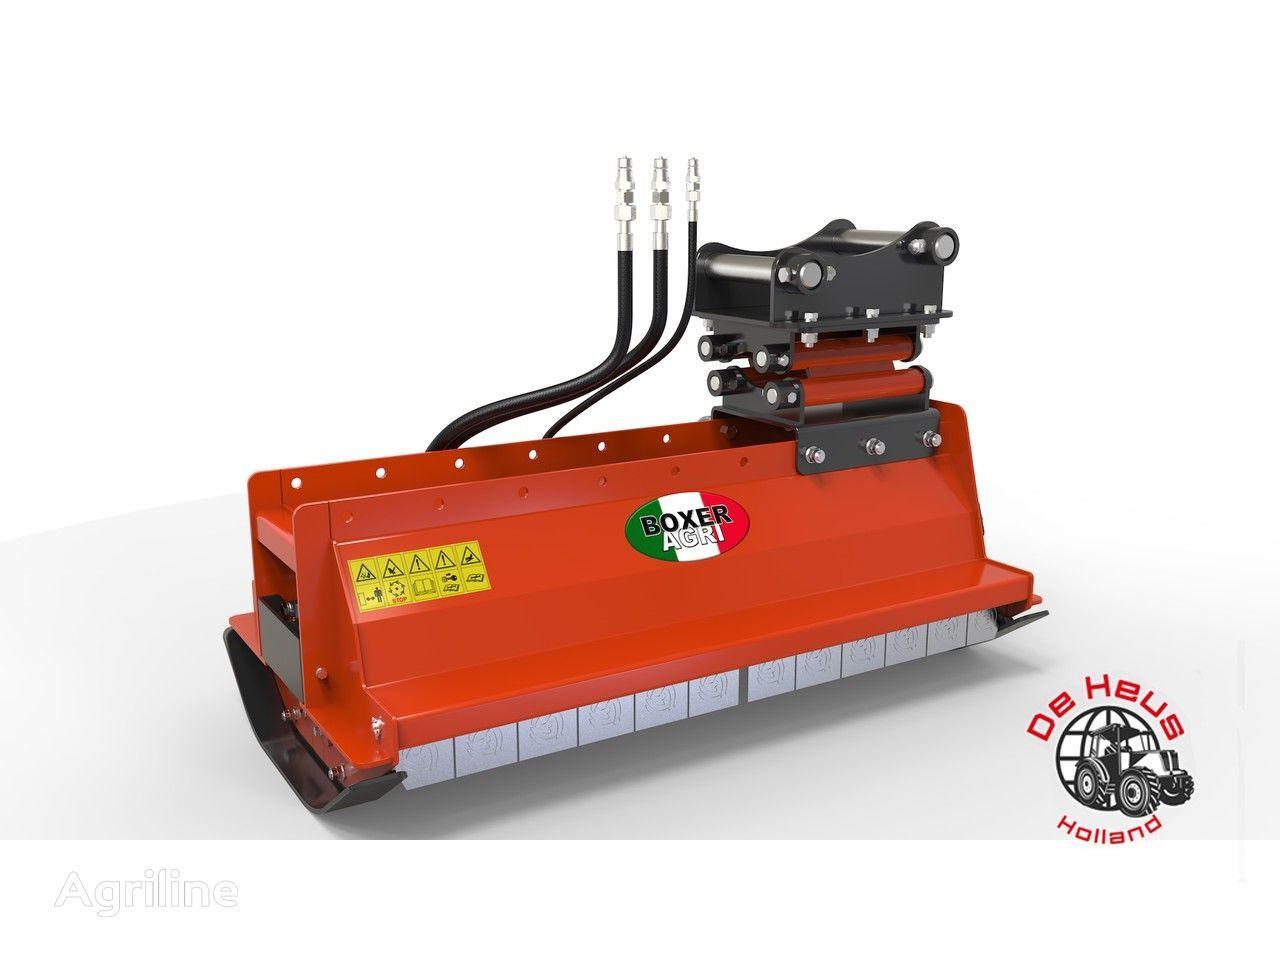 Boxer EXF 600 mower